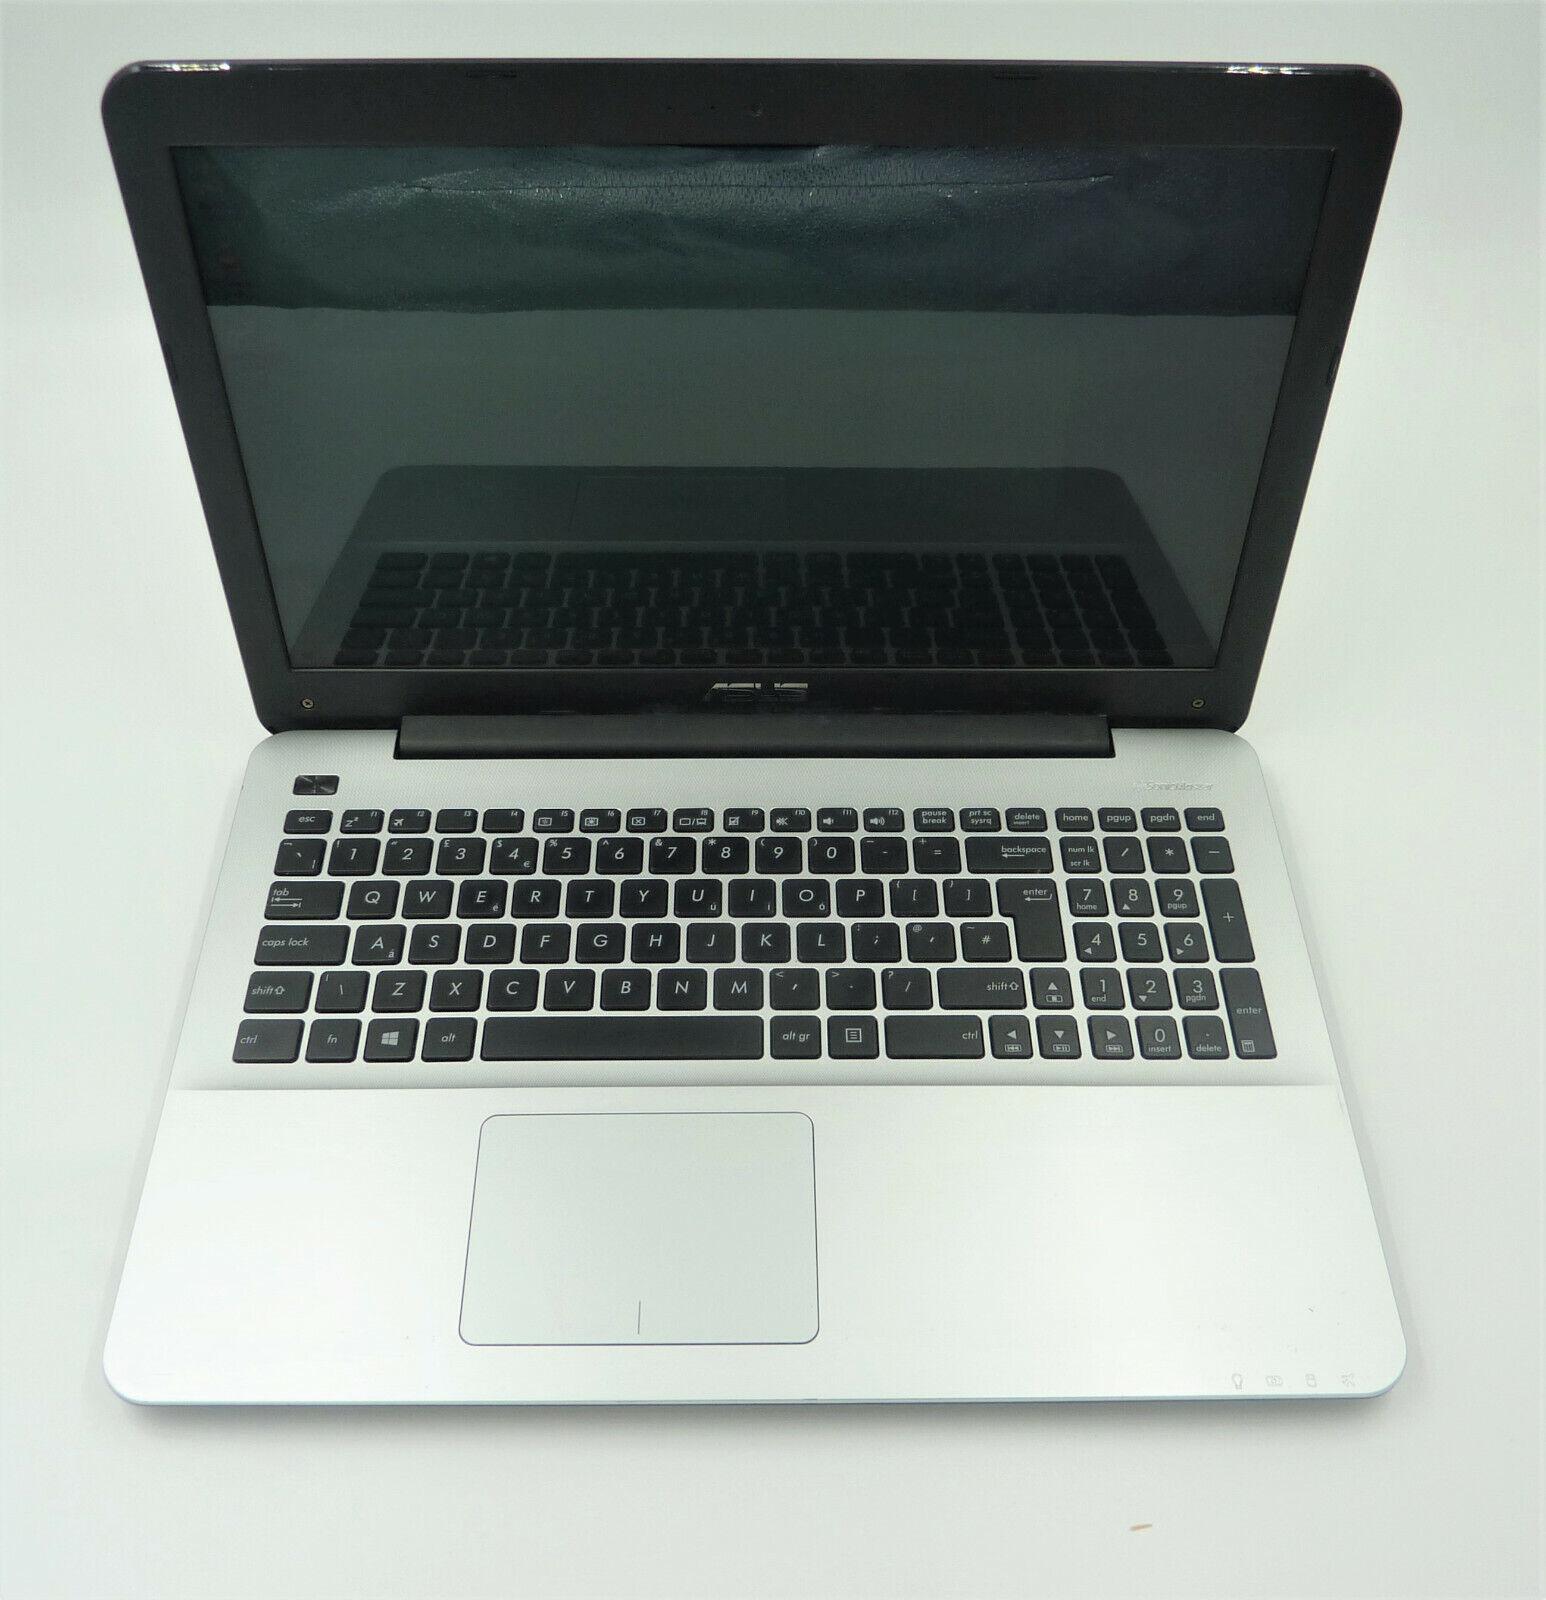 "Laptop Windows - ASUS X555L LAPTOP WINDOWS 10 CORE i5-4210U 1.7GHz 4GB 1TB 15.6"" GRADE B 17943"